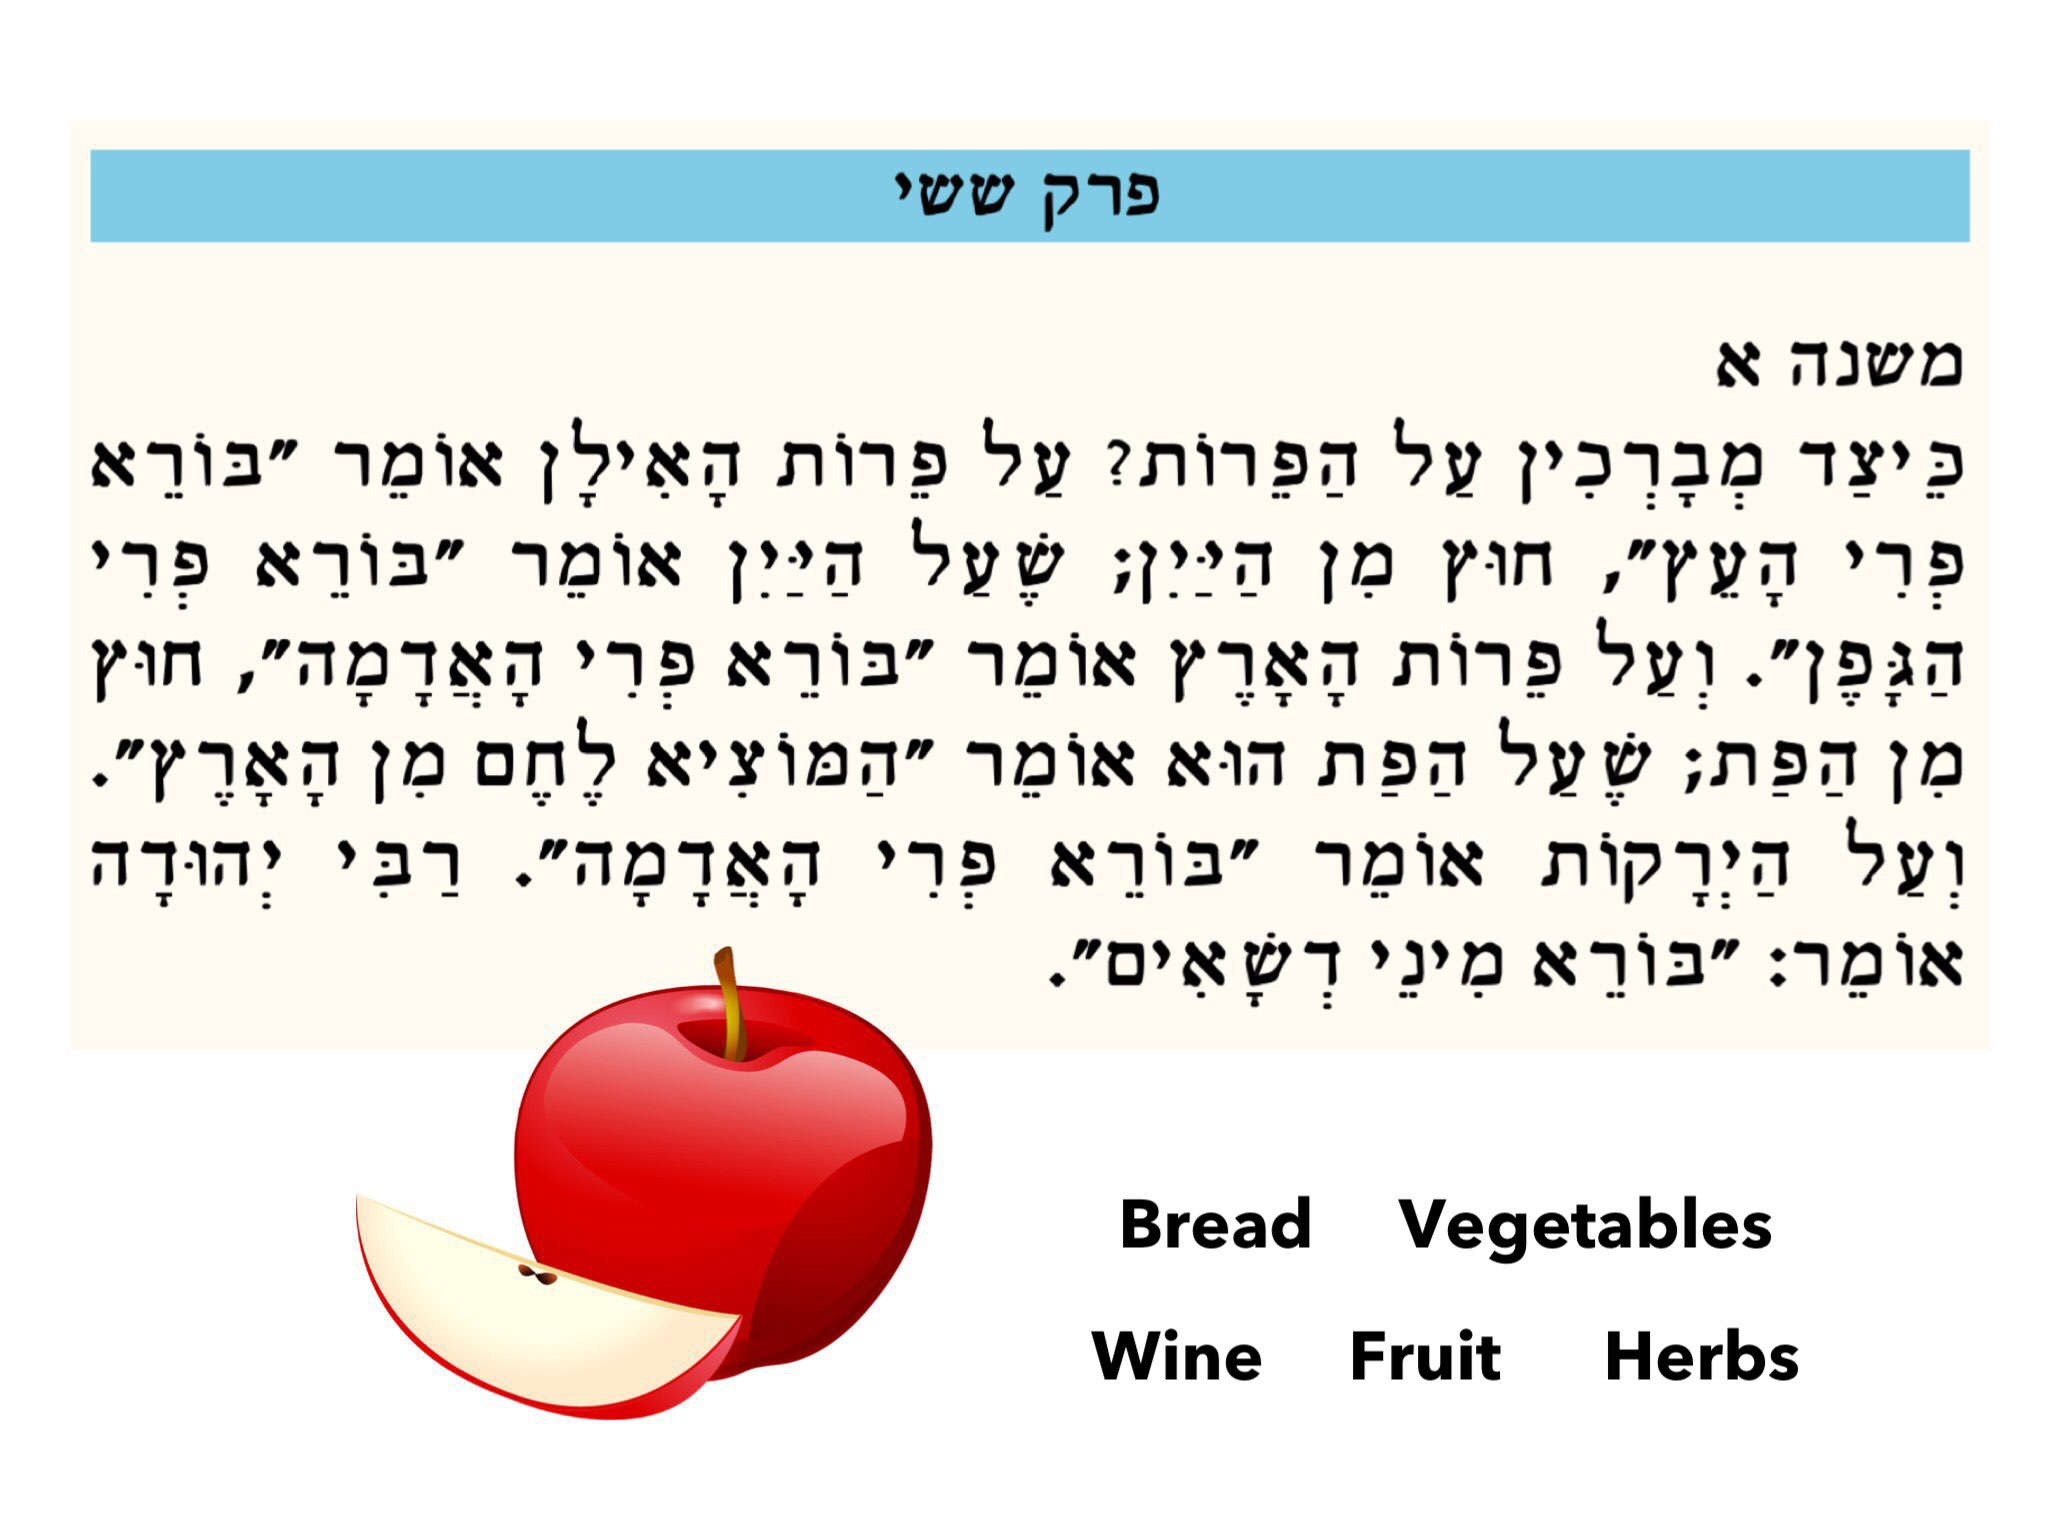 Mishna Brachos 6:1 by Ji Team Sammy - Educational Games for